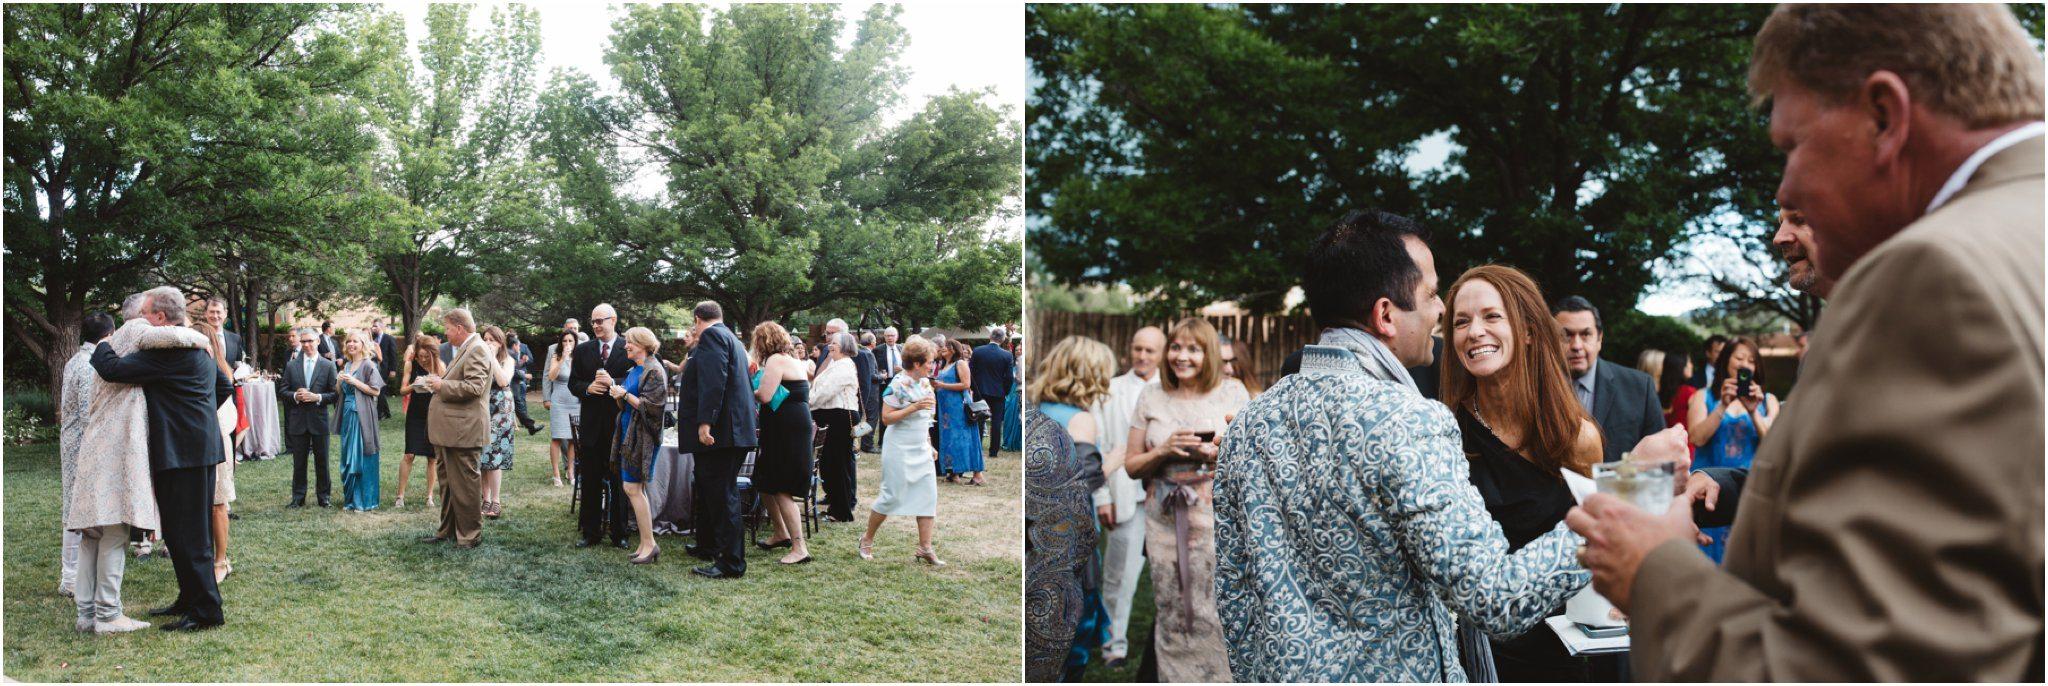 0024new-mexico-same-sex-wedding_santa-fe-wedding-photographer_albuquerque-wedding-photographer_top-photographer_-southwest-wedding-photography_-blue-rose-studio